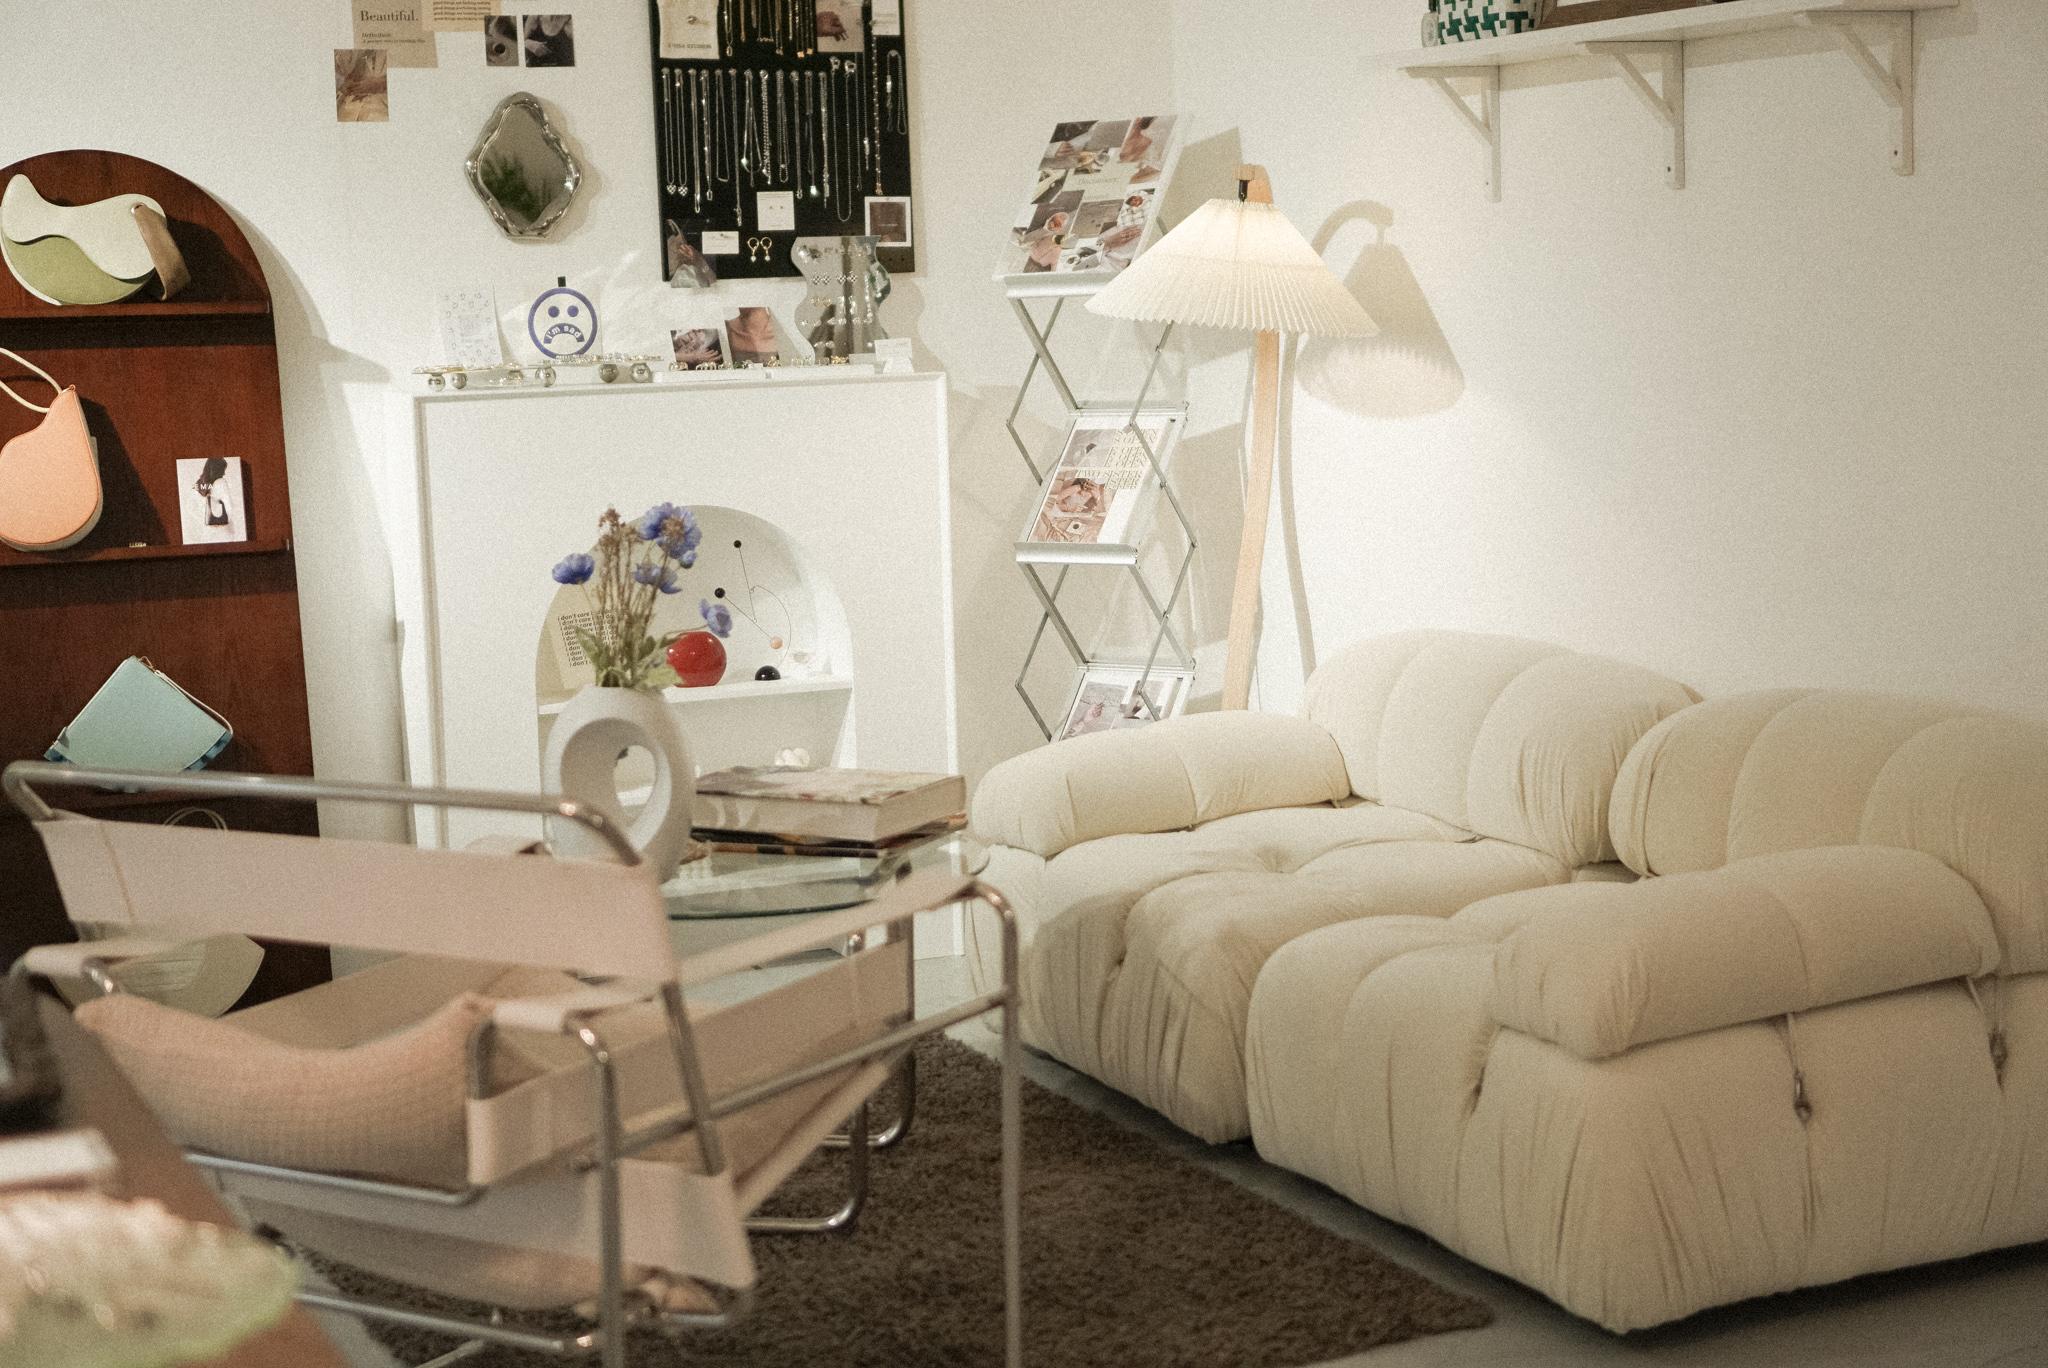 Morii Art Studio